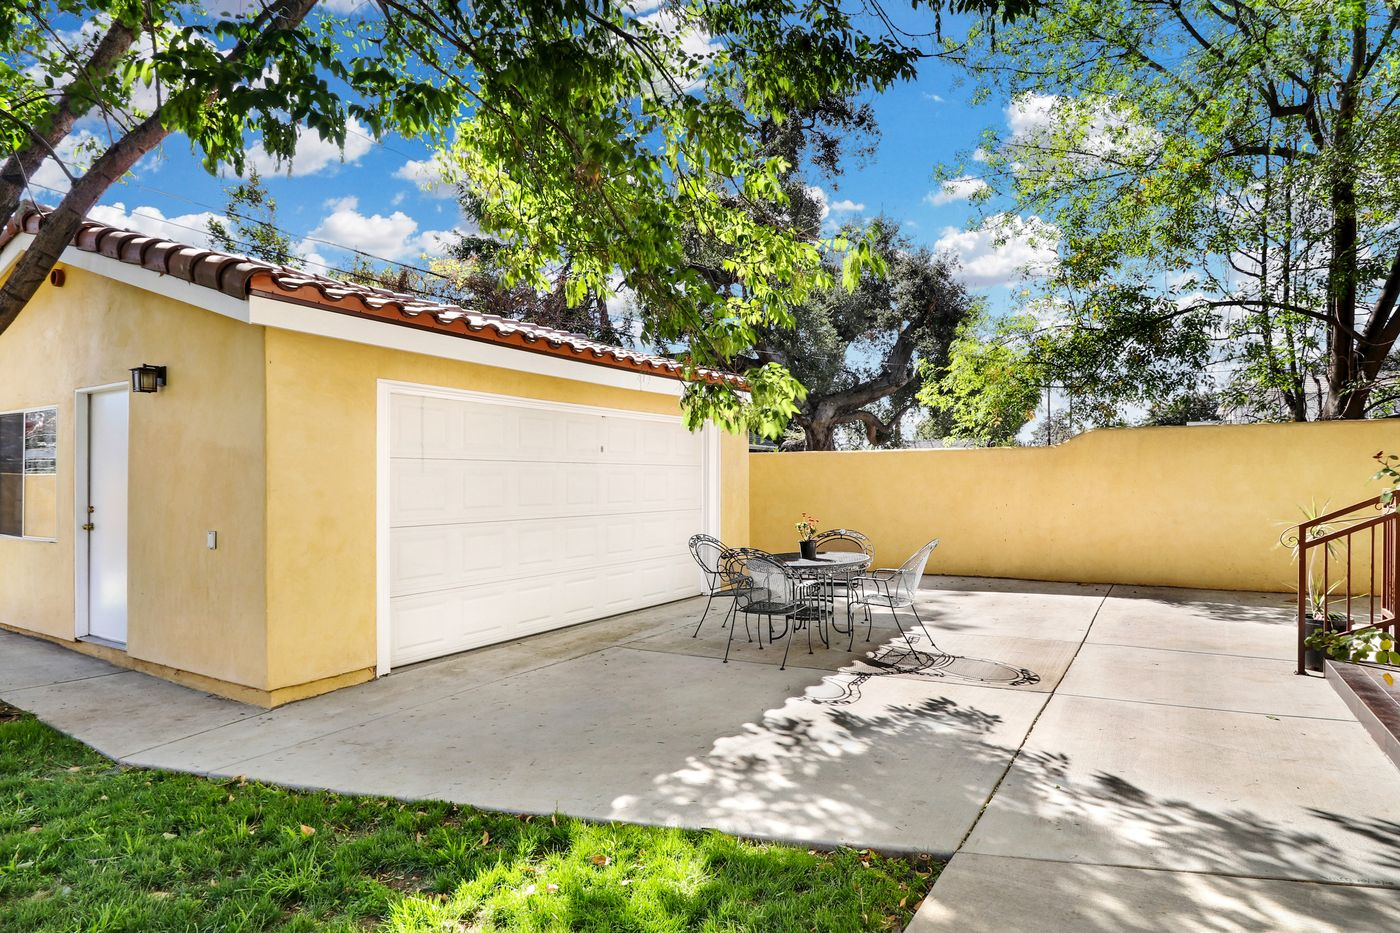 real-estate-photography-los-angeles-pasadena-glendale-burbank-AD-photographer-26